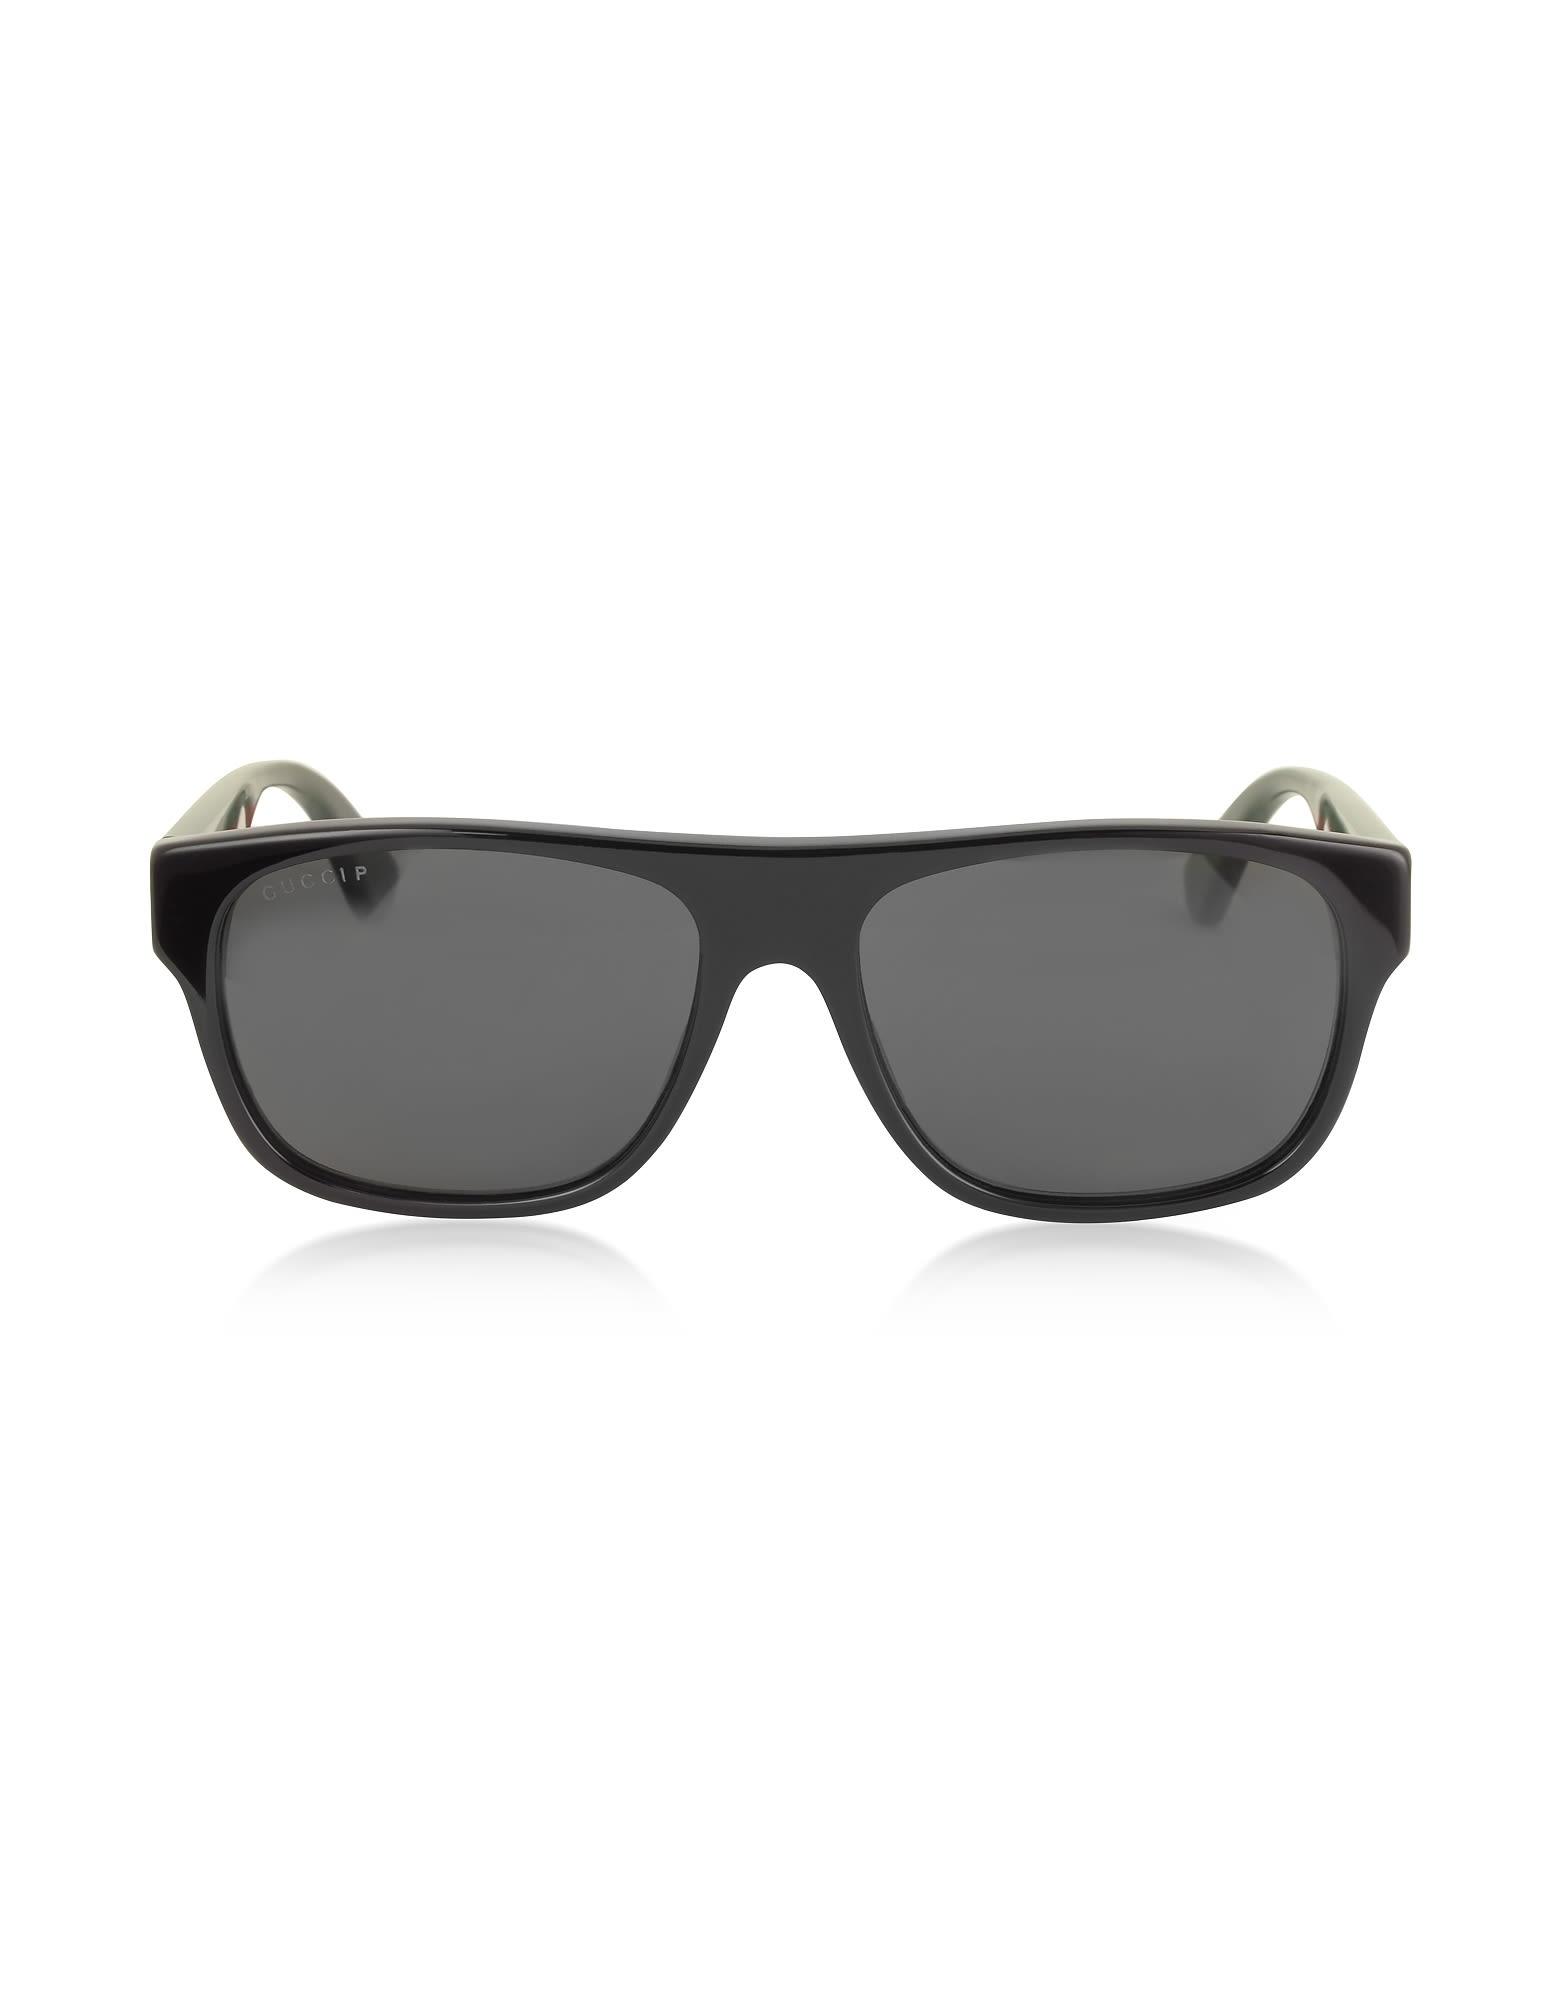 874f3e19ae3 Gucci Gg0341S Rectangular-Frame Acetate Sunglasses In Black Gray ...